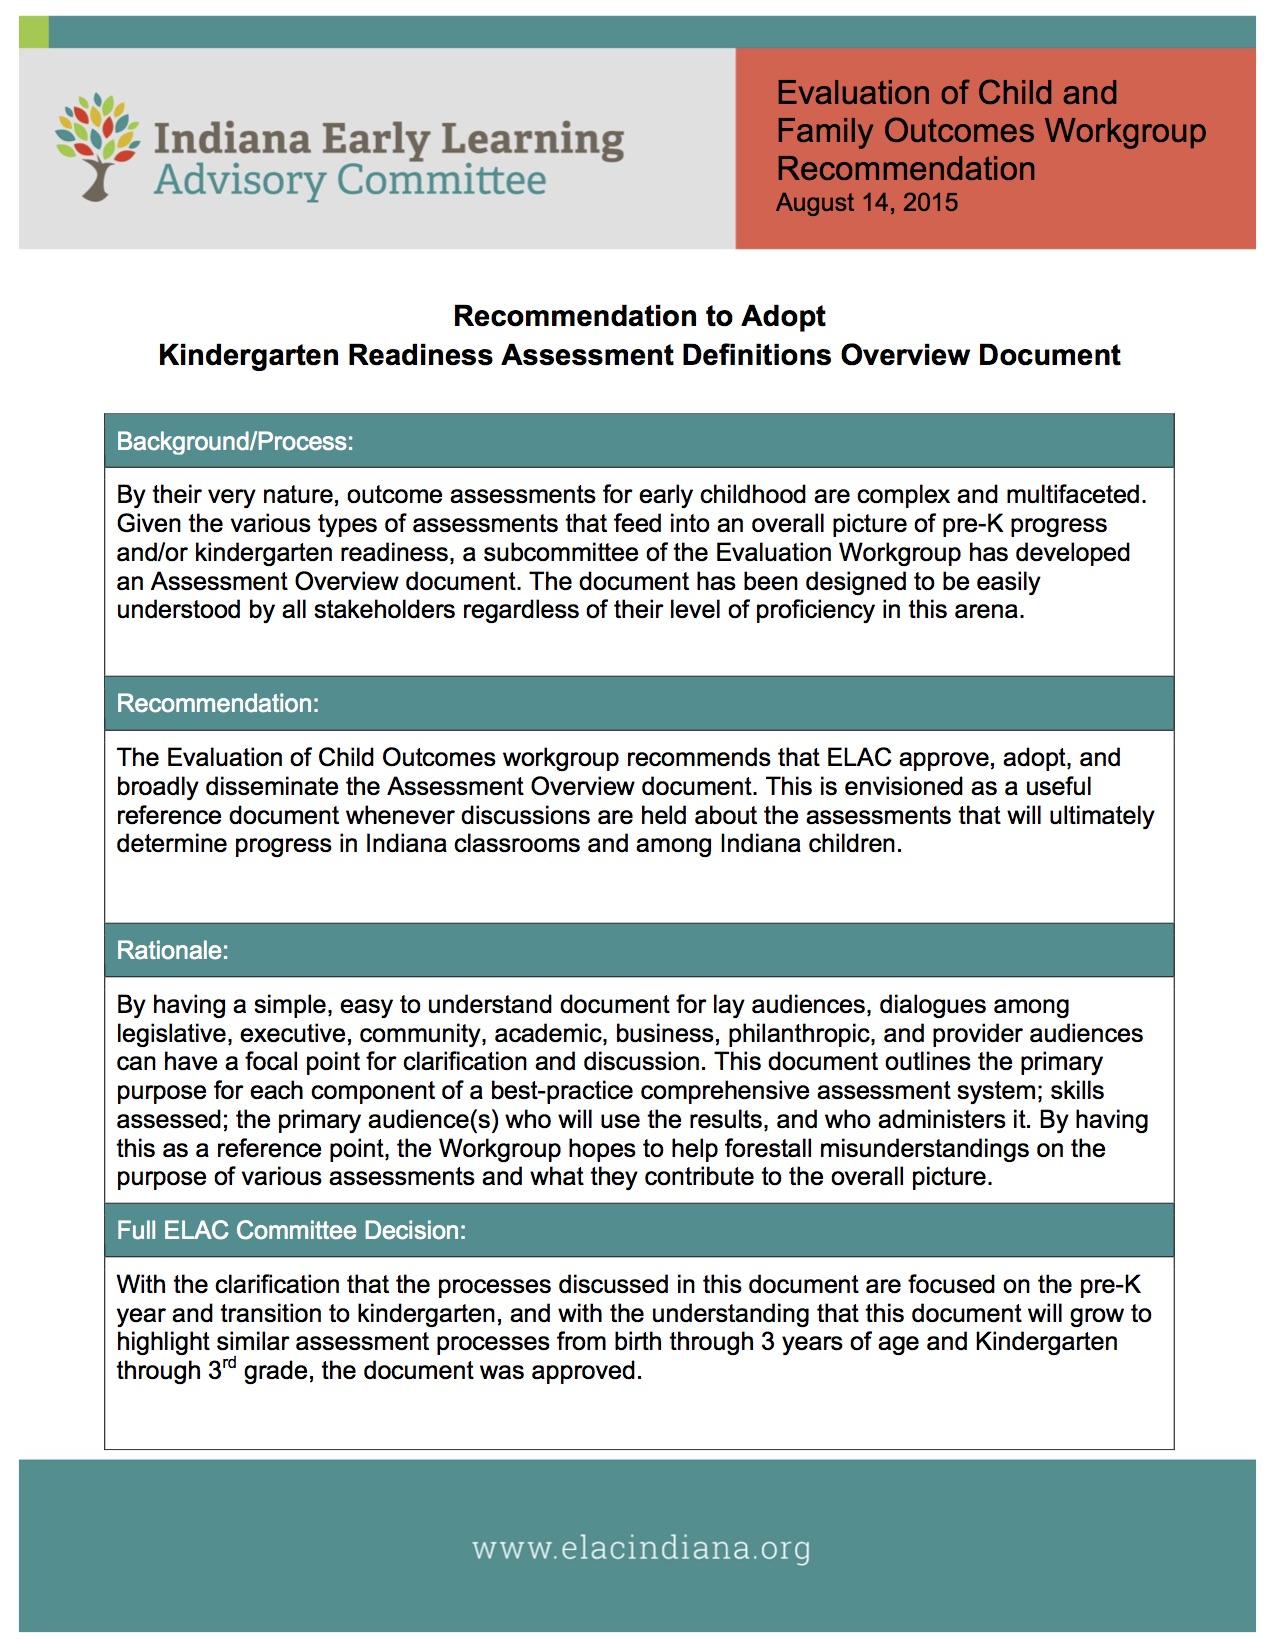 Kindergarten Readiness Assessment Definitions Overview Document